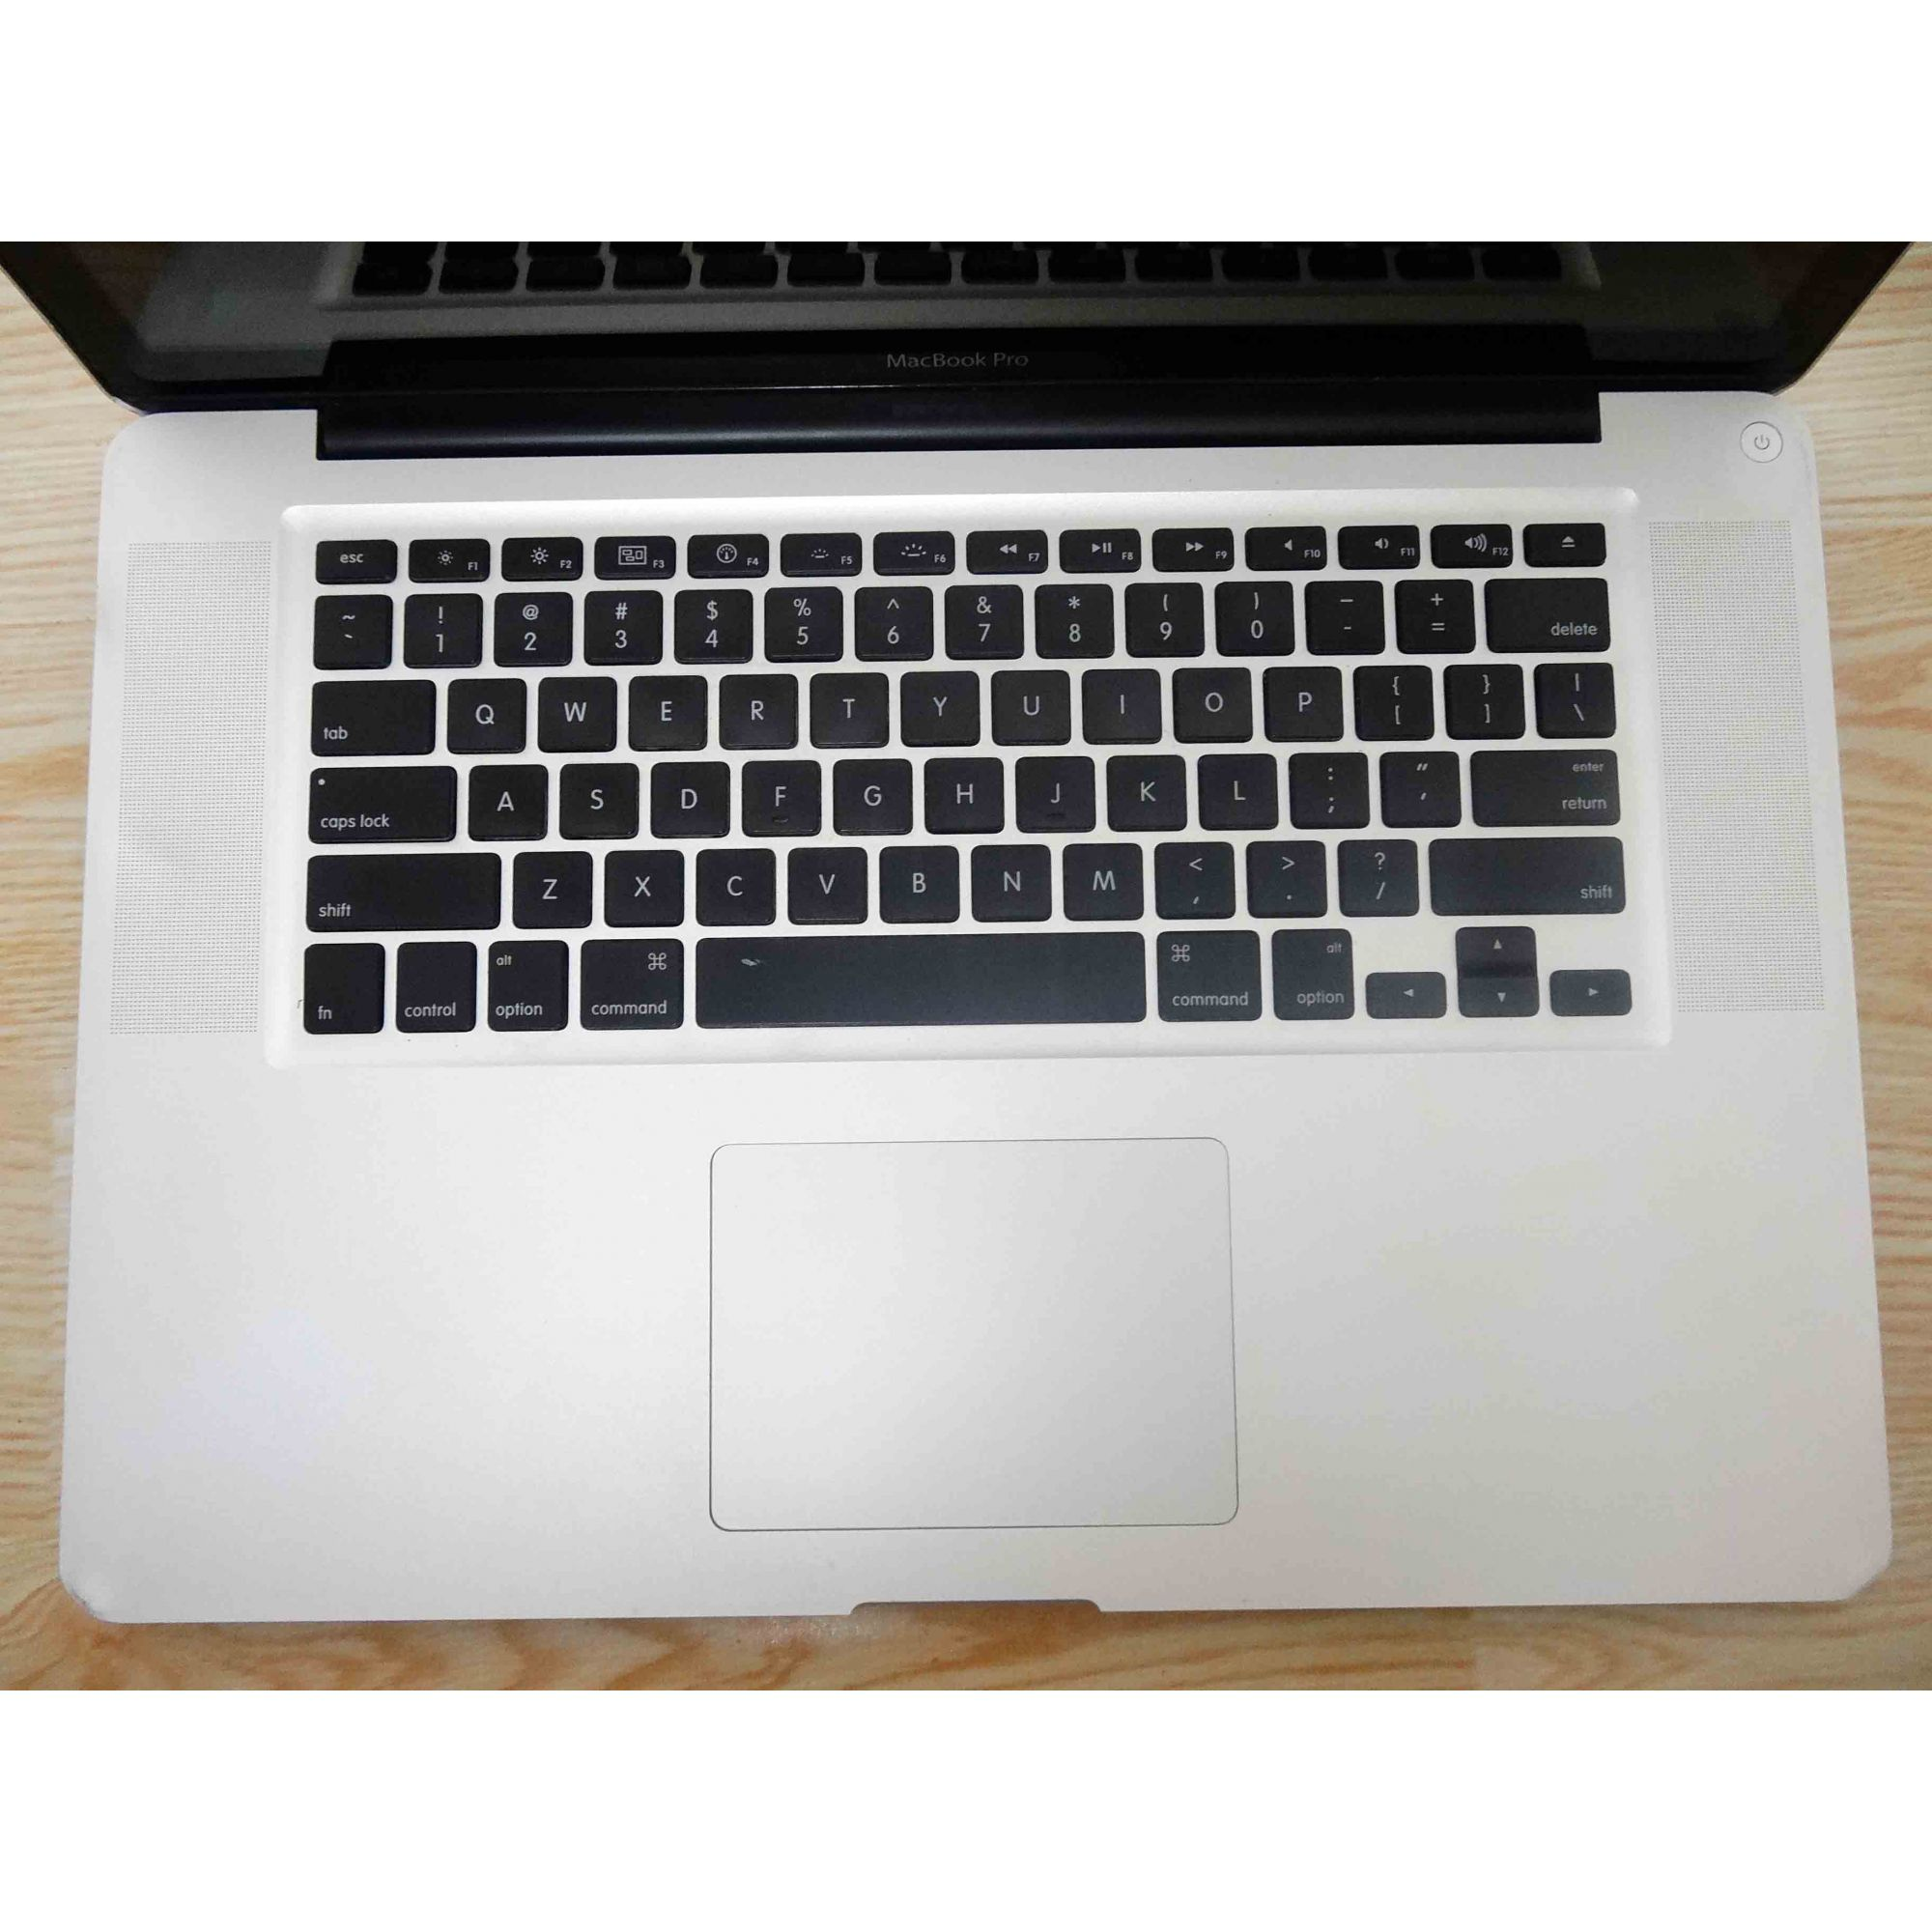 Macbook Pro MC373LL/A 15.4'' Core i7 2.66GHz 8GB HD-750GB